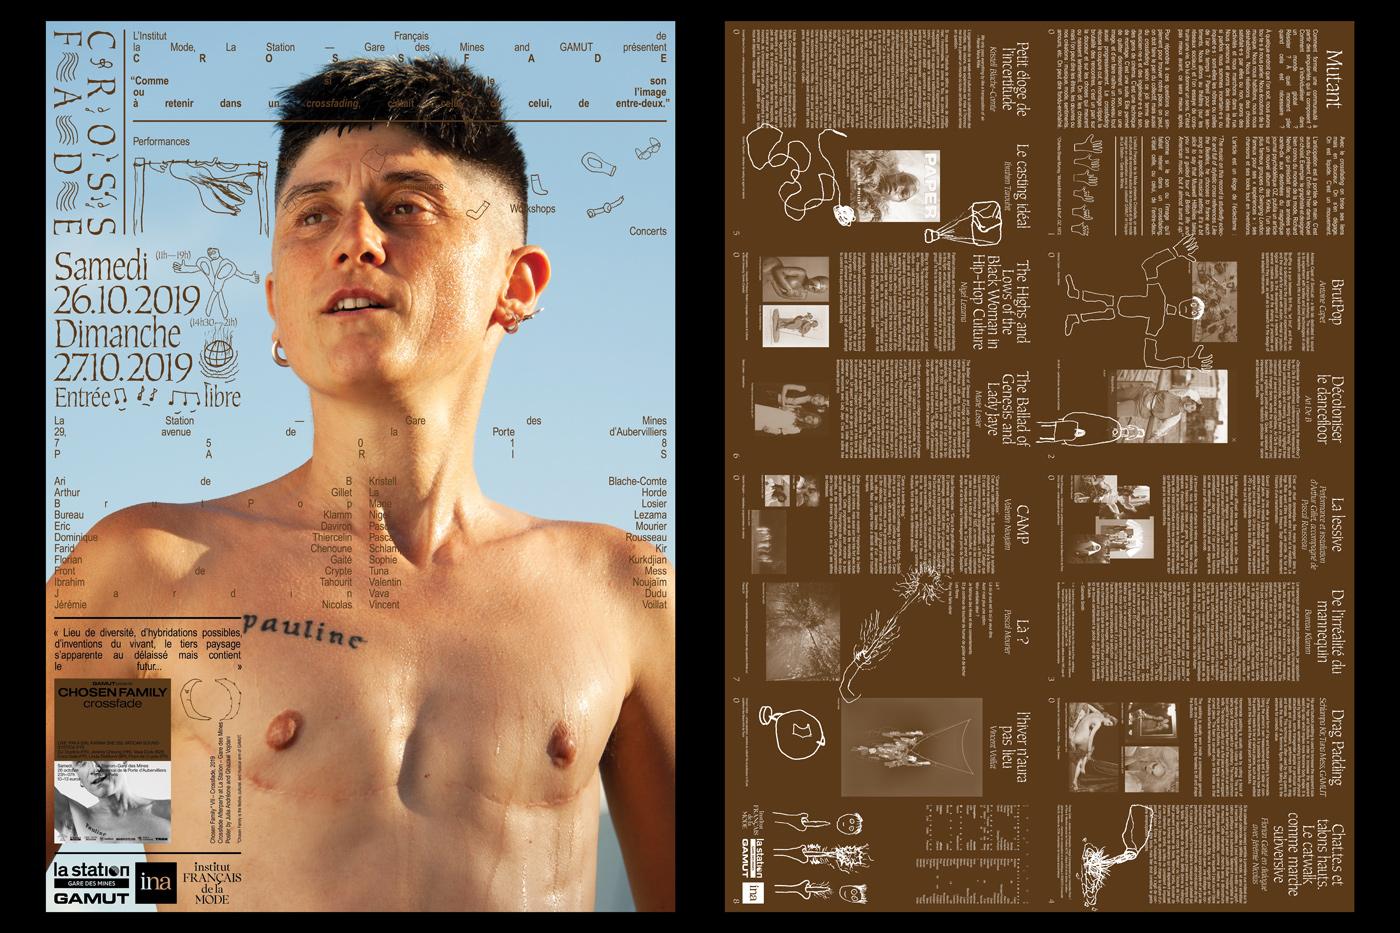 13 collide24 Europium - Europium's collaborative practice explores the relationship between photography and graphic design